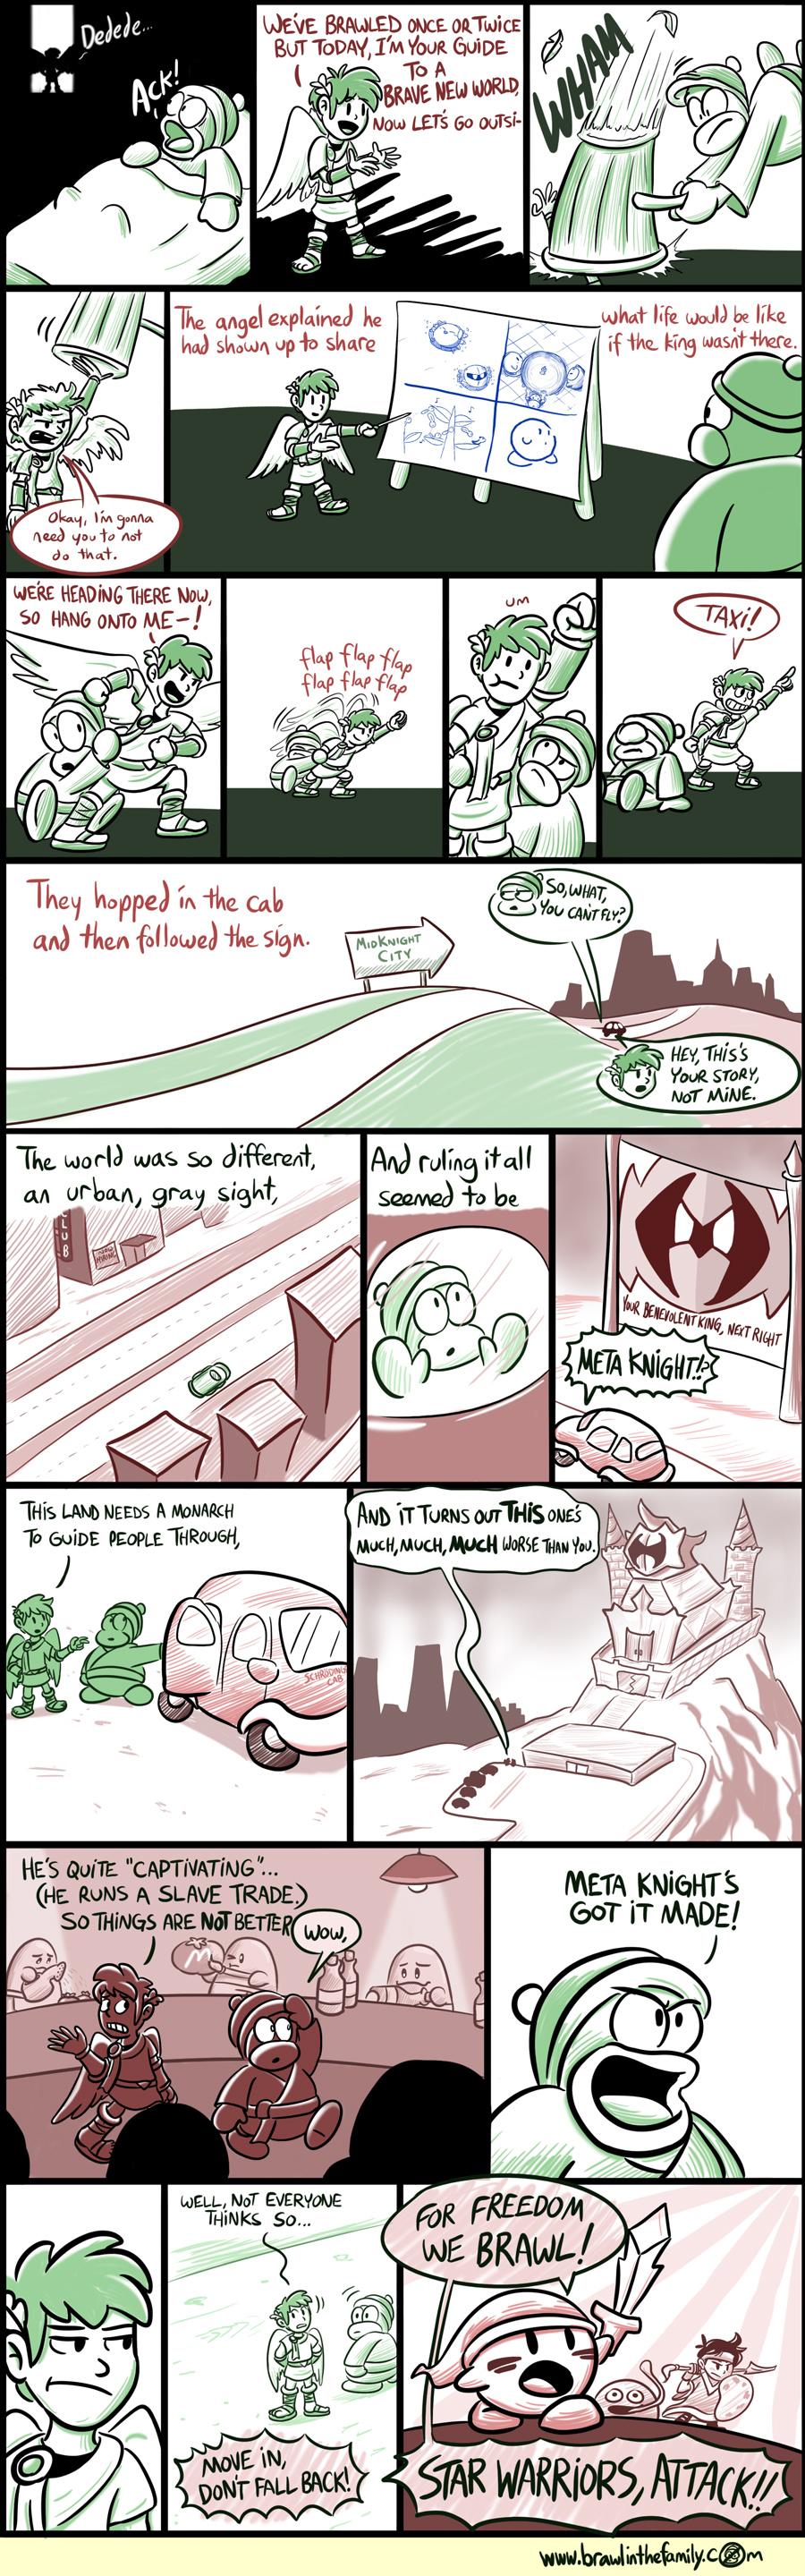 534 – It's a Plunderful Life (Part 2)